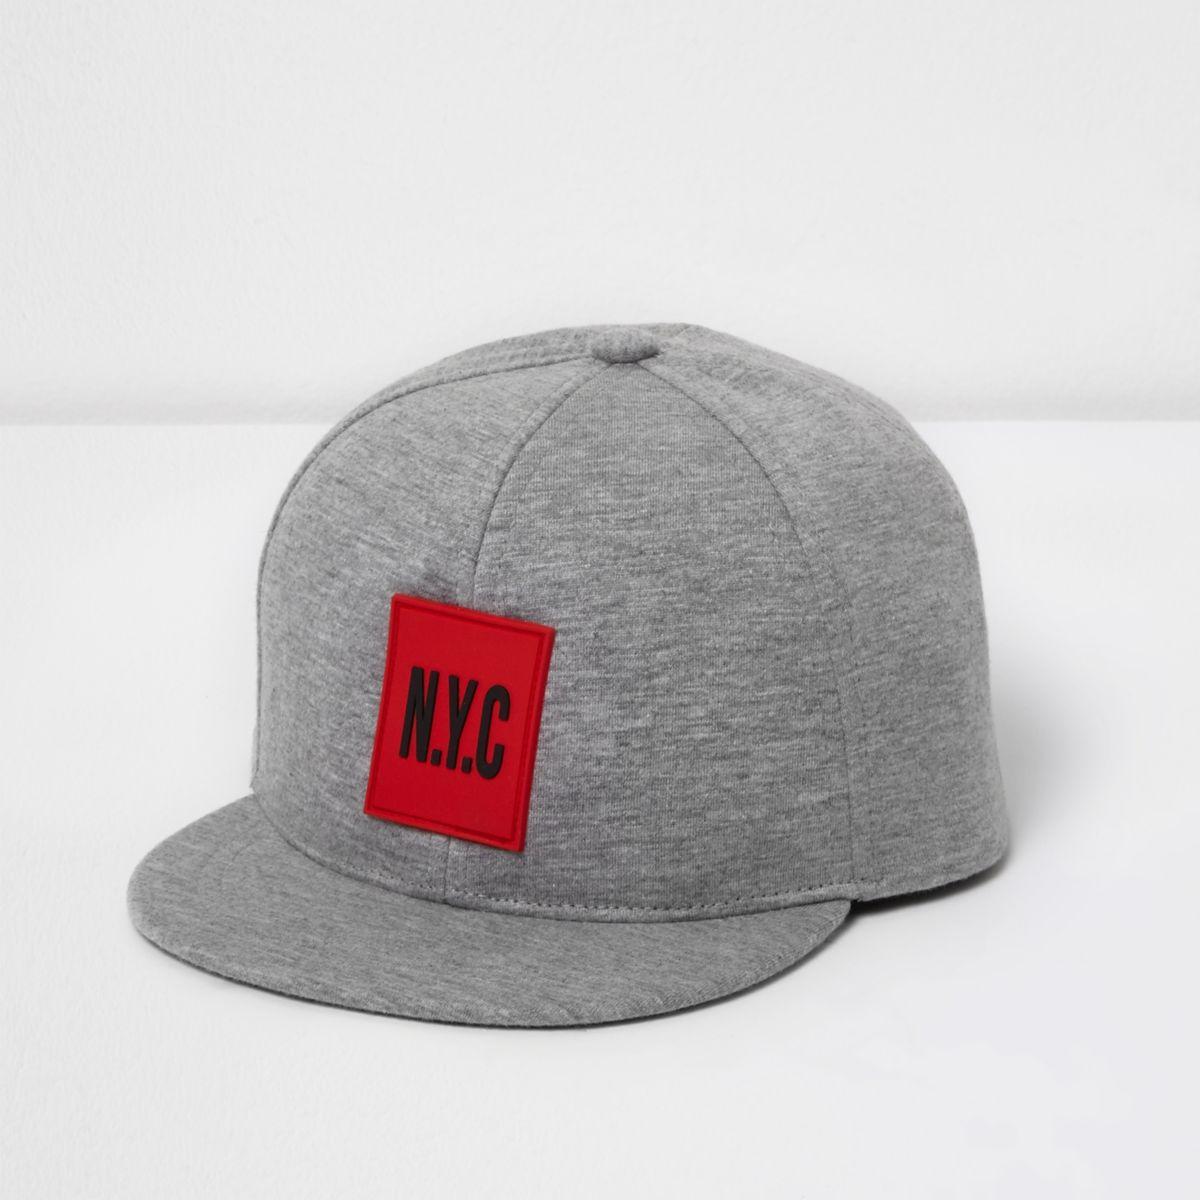 Mini boys grey jersey 'NYC' flat peak cap